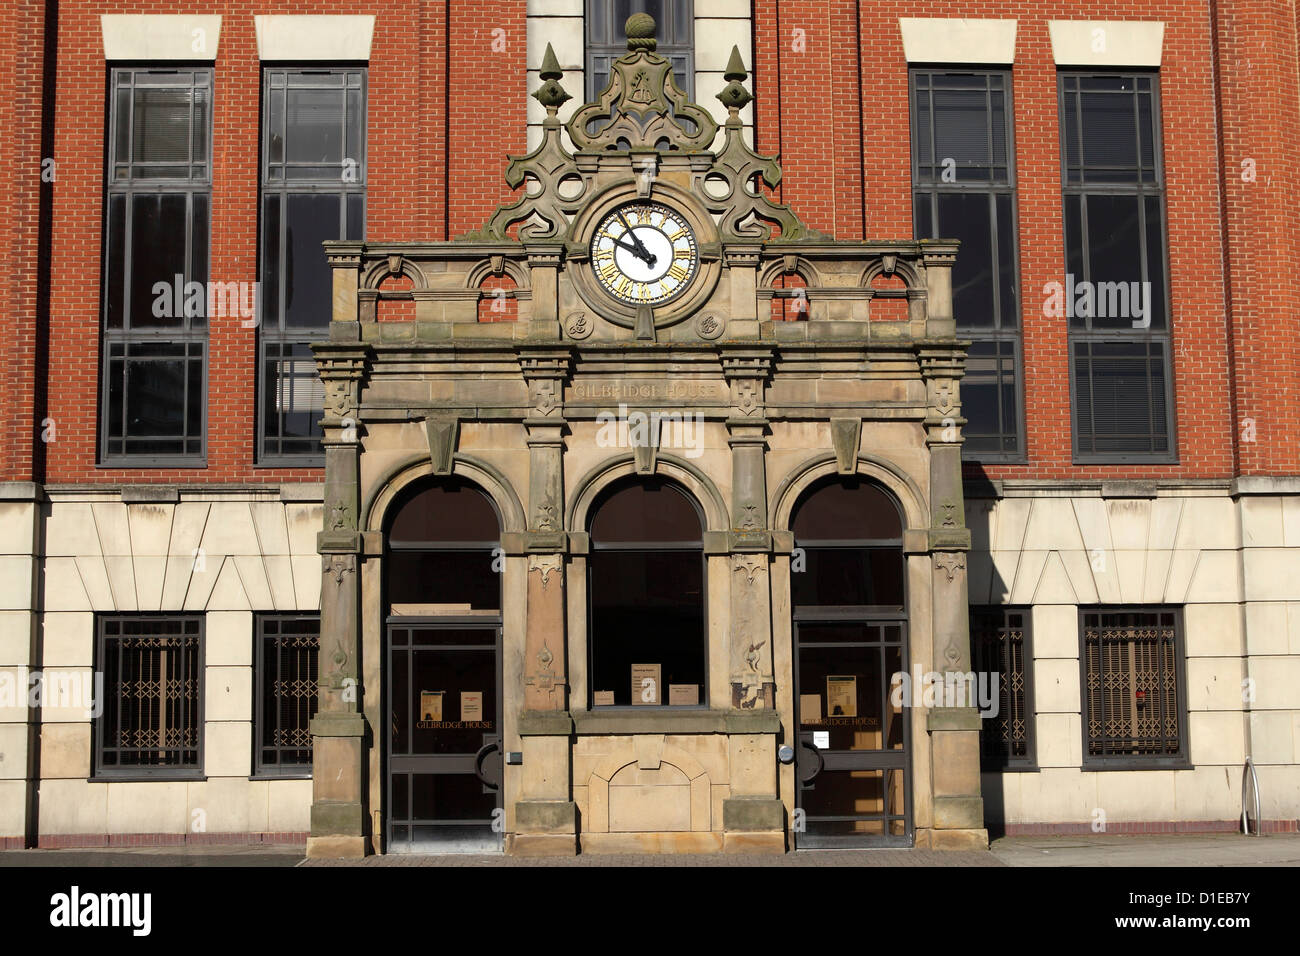 The Grade II Listed entrance facade at Gilbridge House, Sunderland, Tyne and Wear, England, United Kingdom, Europe - Stock Image